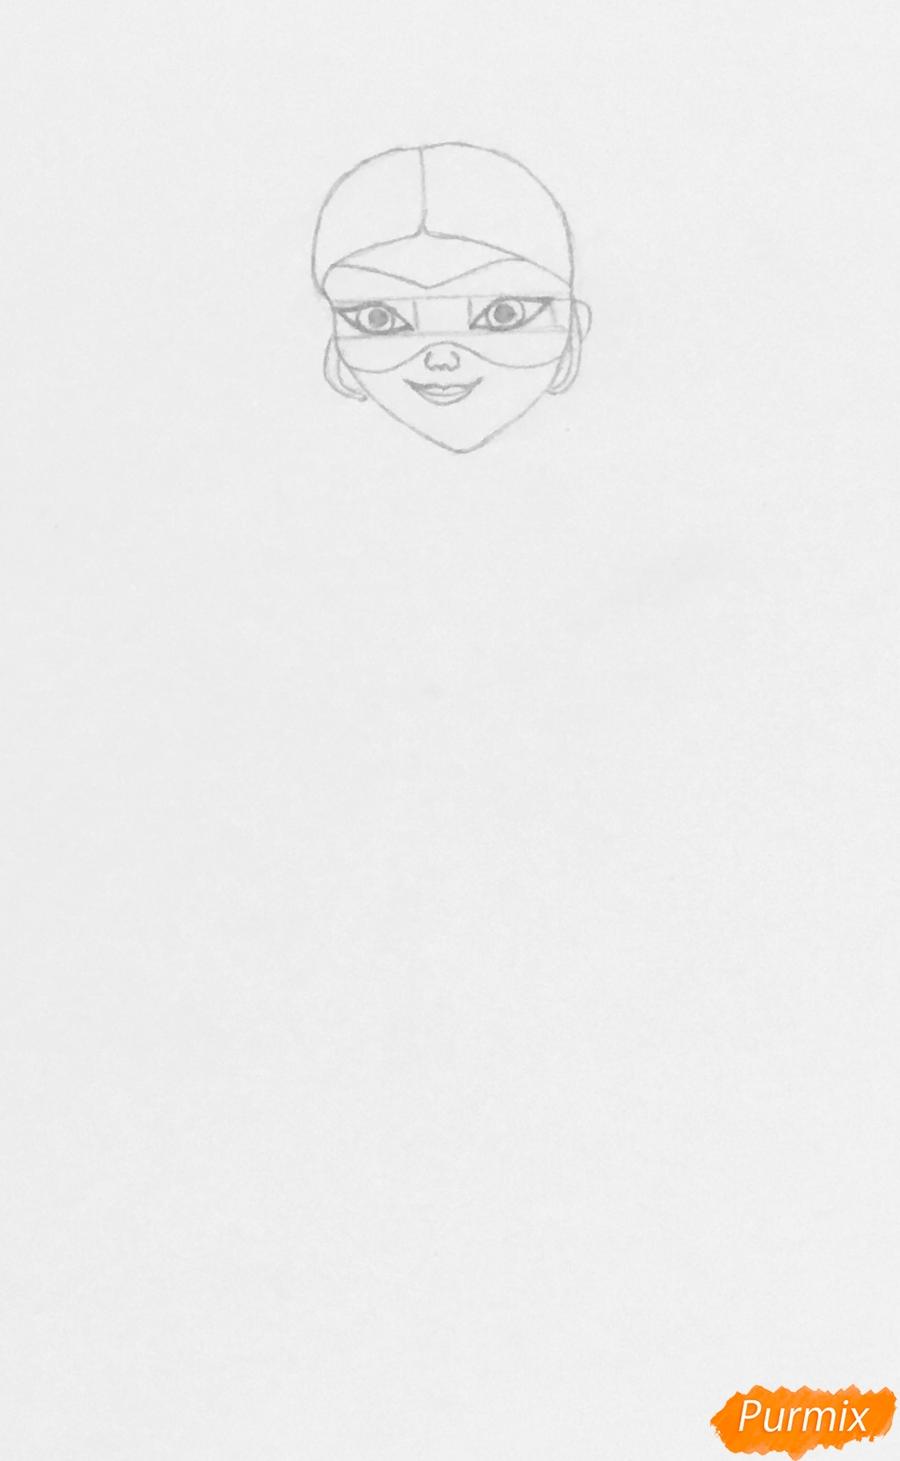 Рисуем Хлою пчелу из мультфильма Леди Баг и Супер Кот - шаг 2